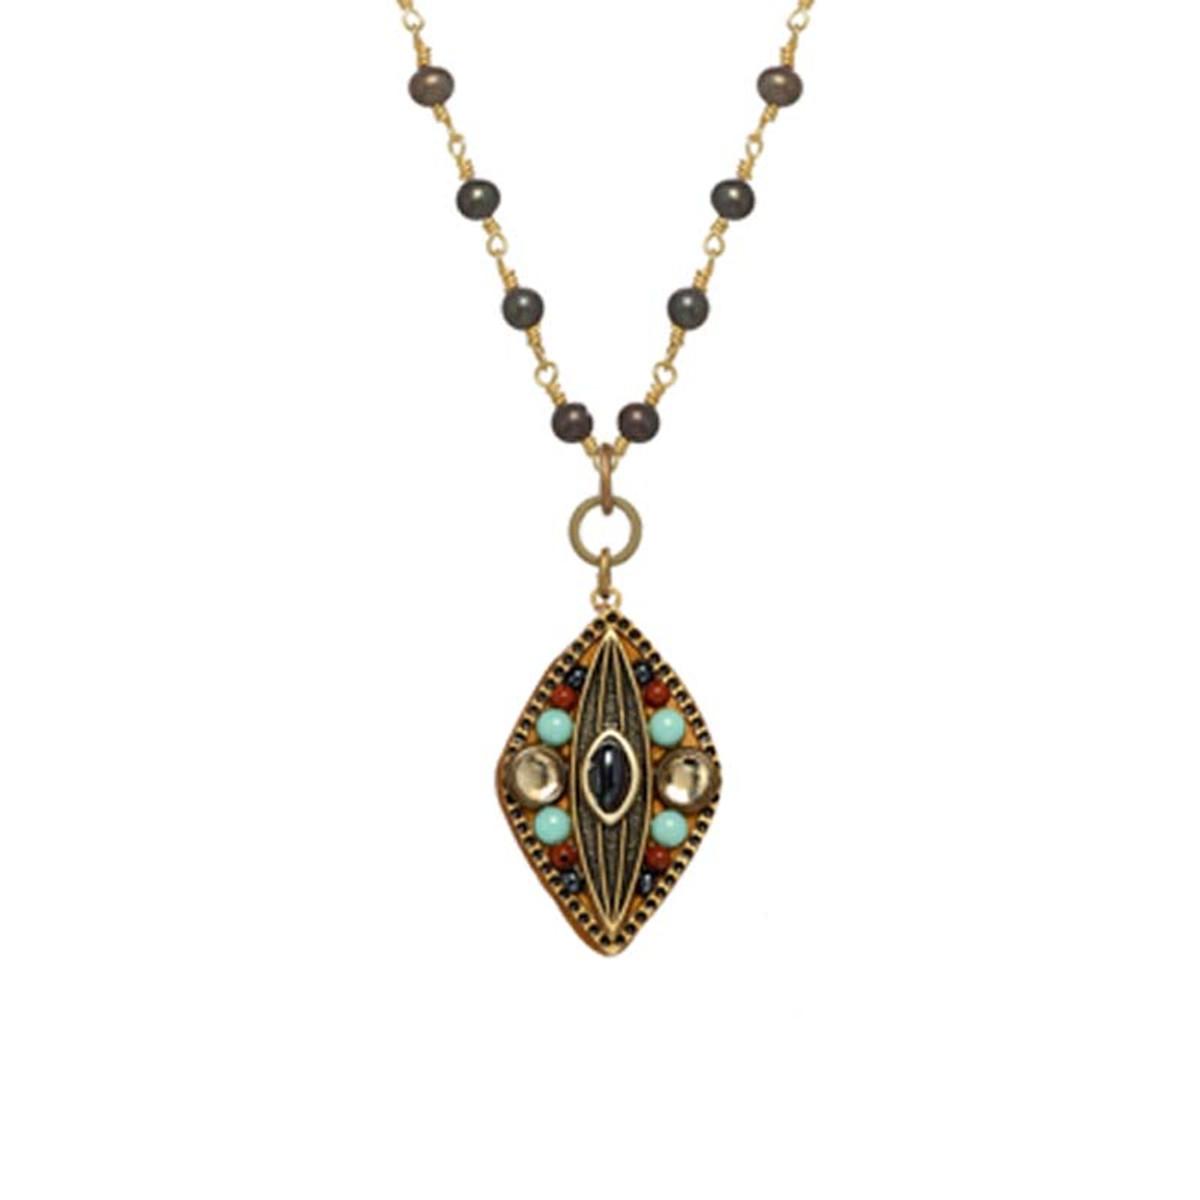 Michal Golan Southwest Style Necklace